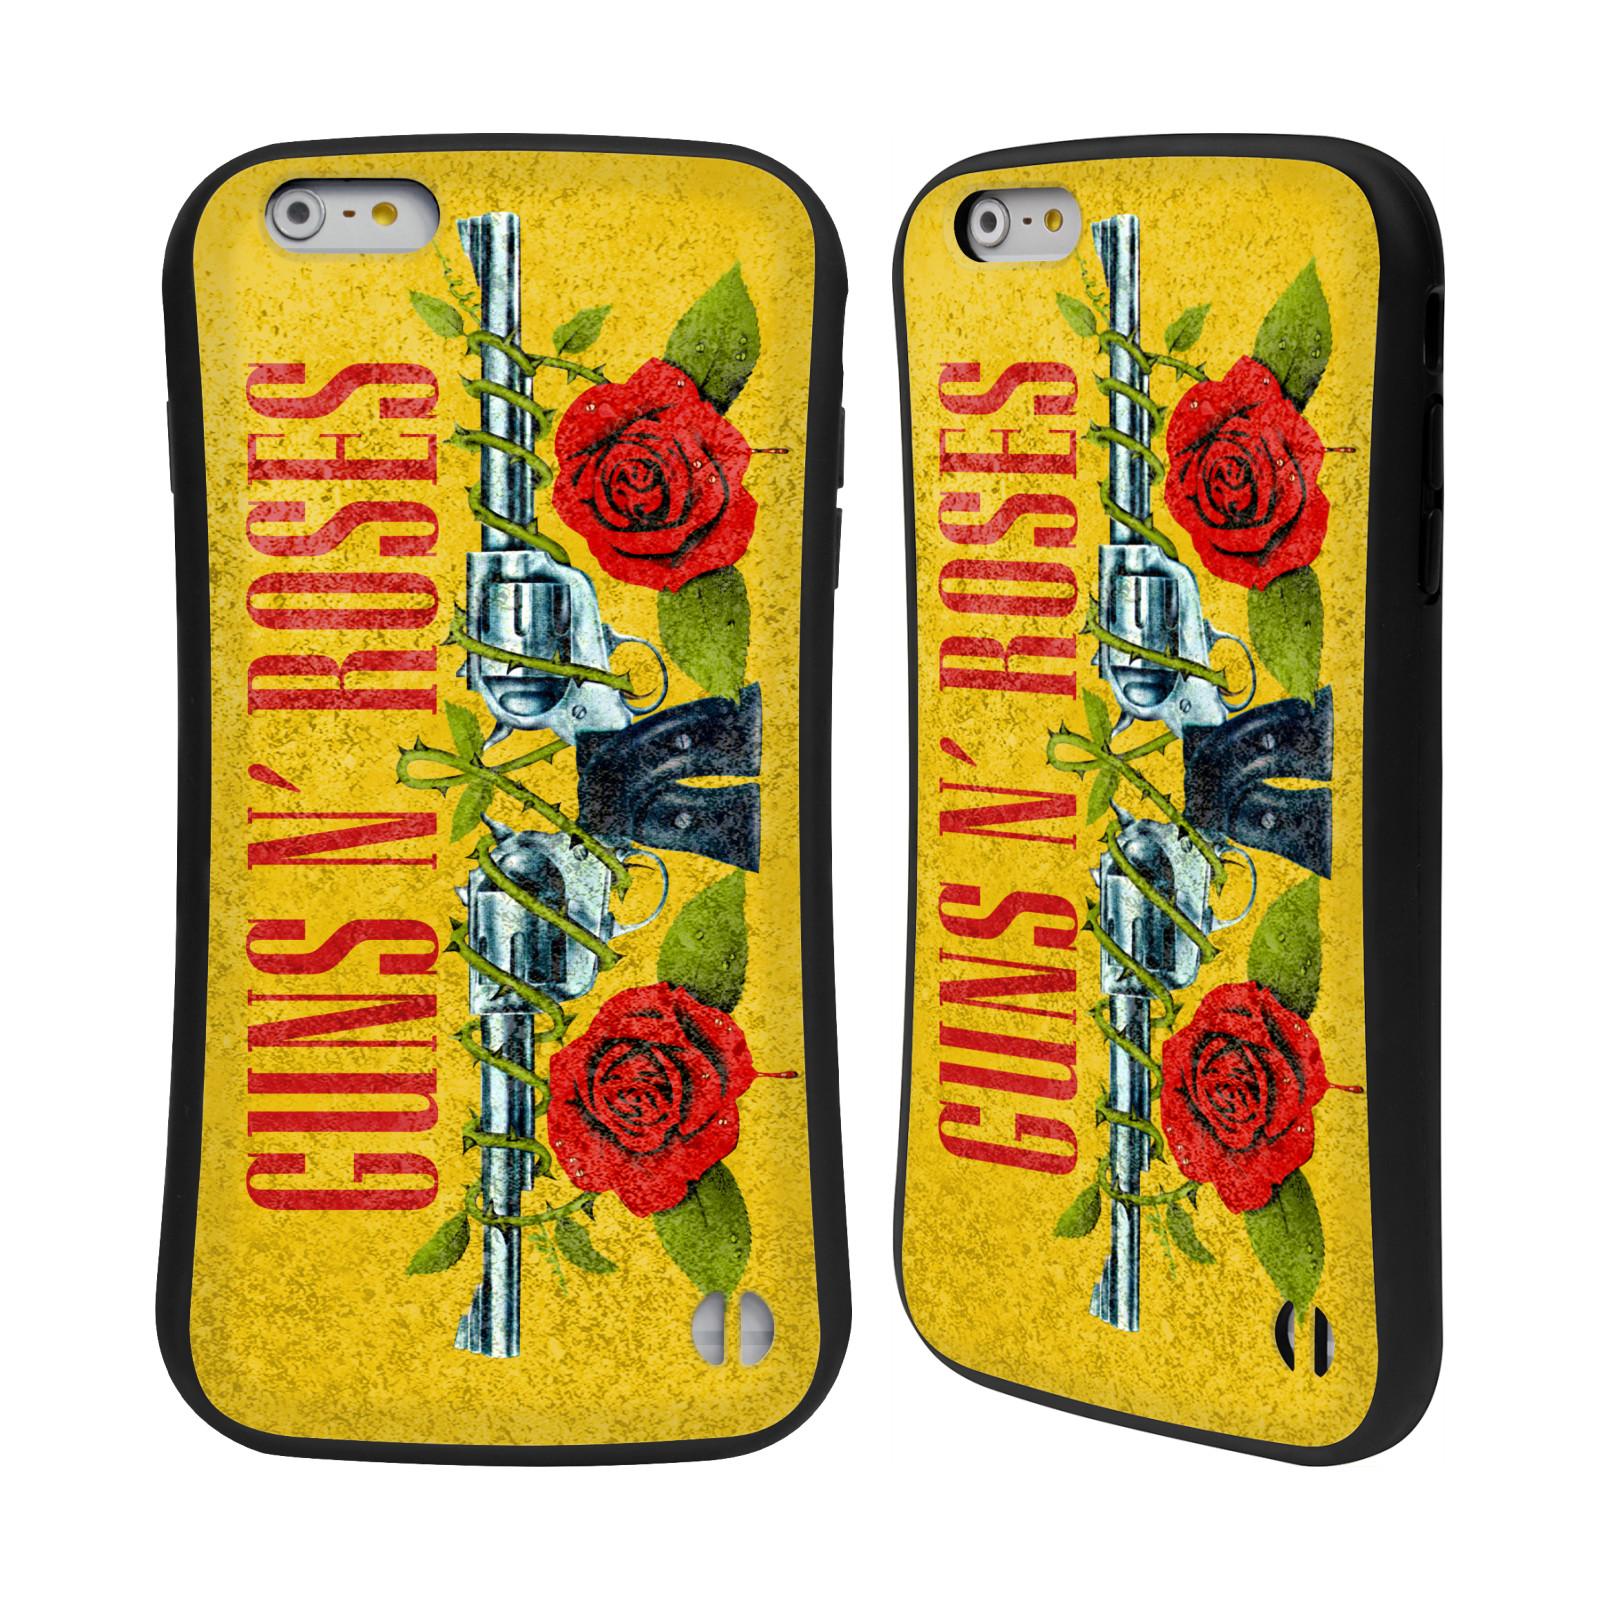 ae728eca1 HEAD CASE odolný obal na mobil Apple Iphone 6/6S PLUS hudební skupina Guns  N Roses pistole a růže žluté pozadí